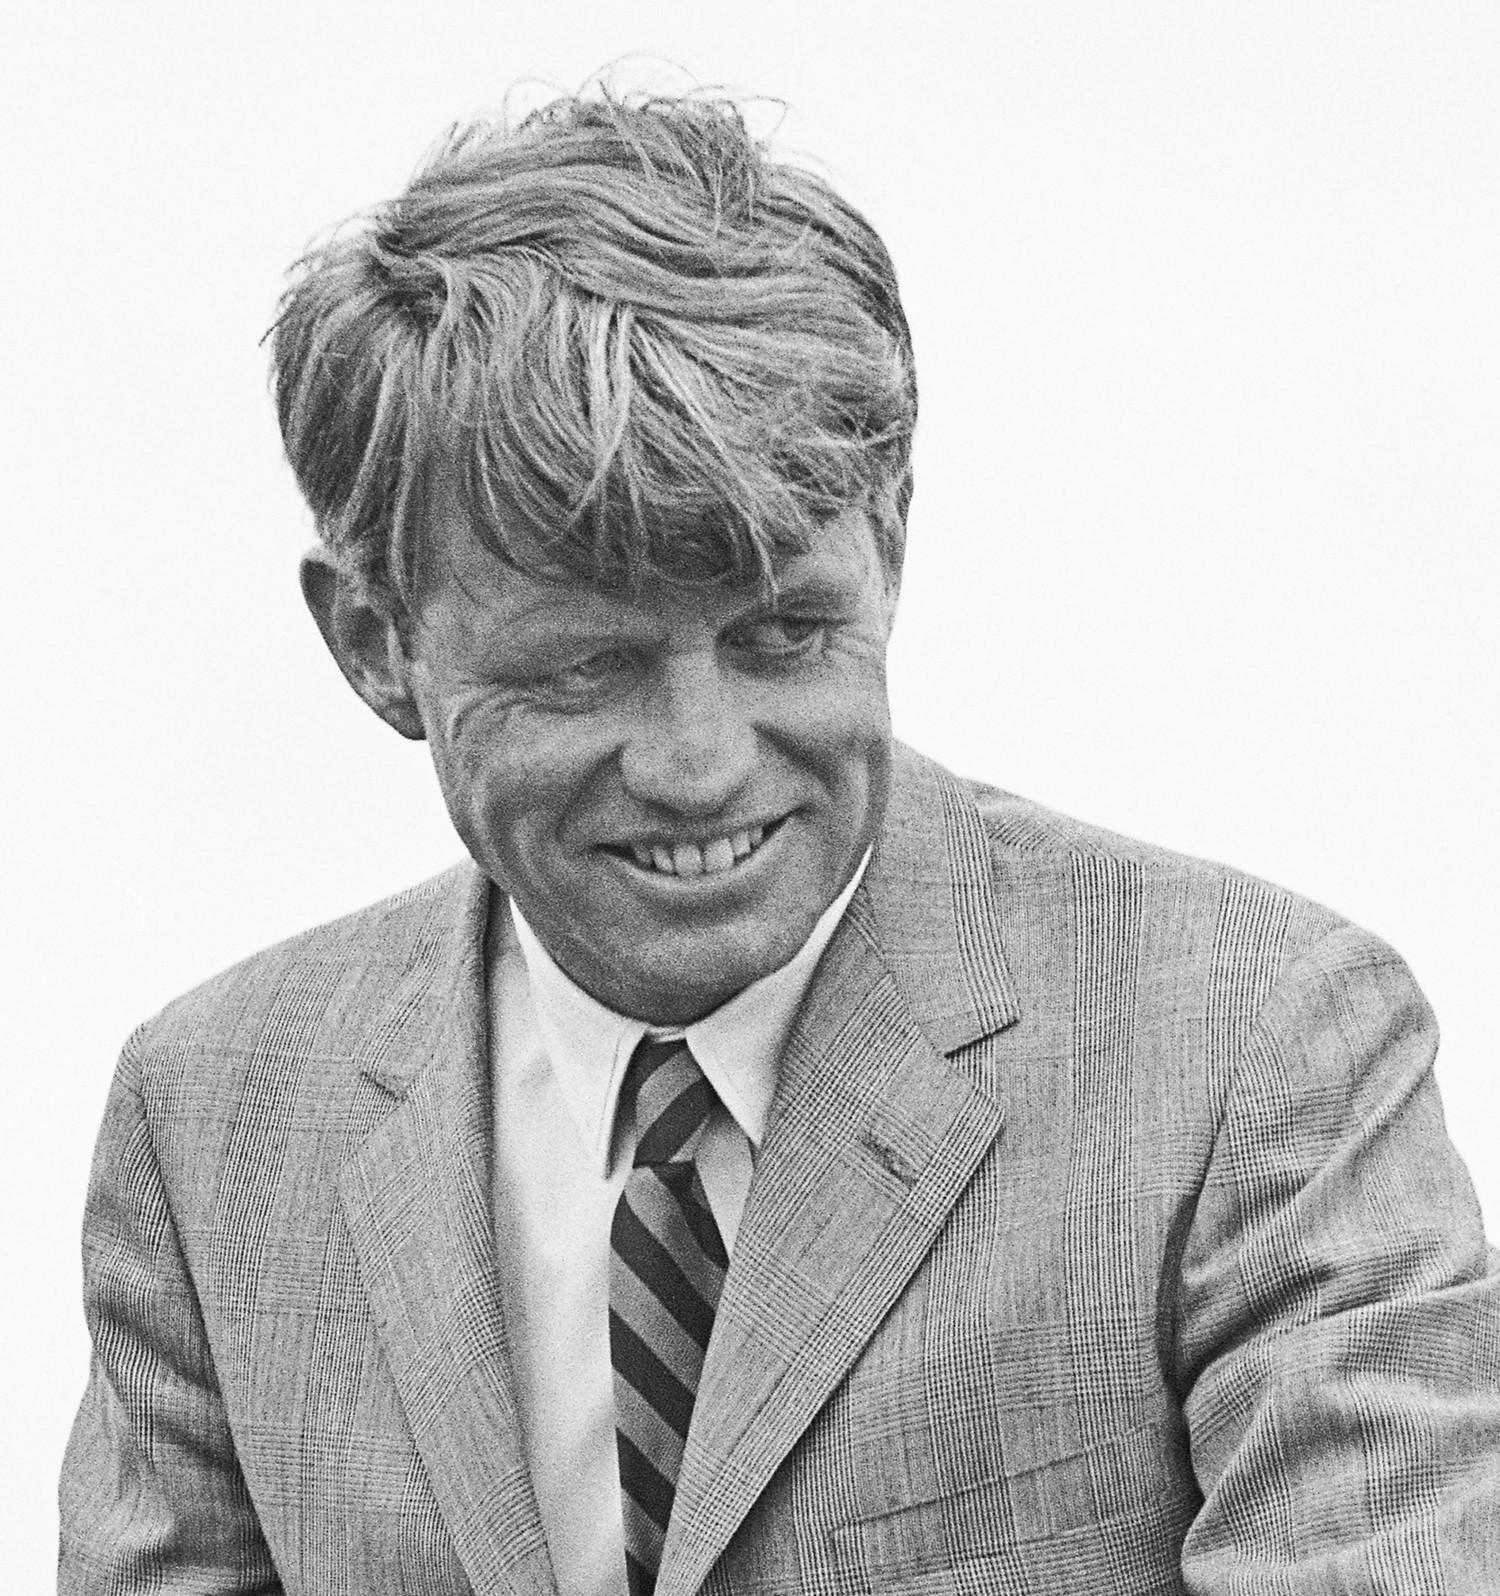 Robert-Kennedy-portrait.jpg